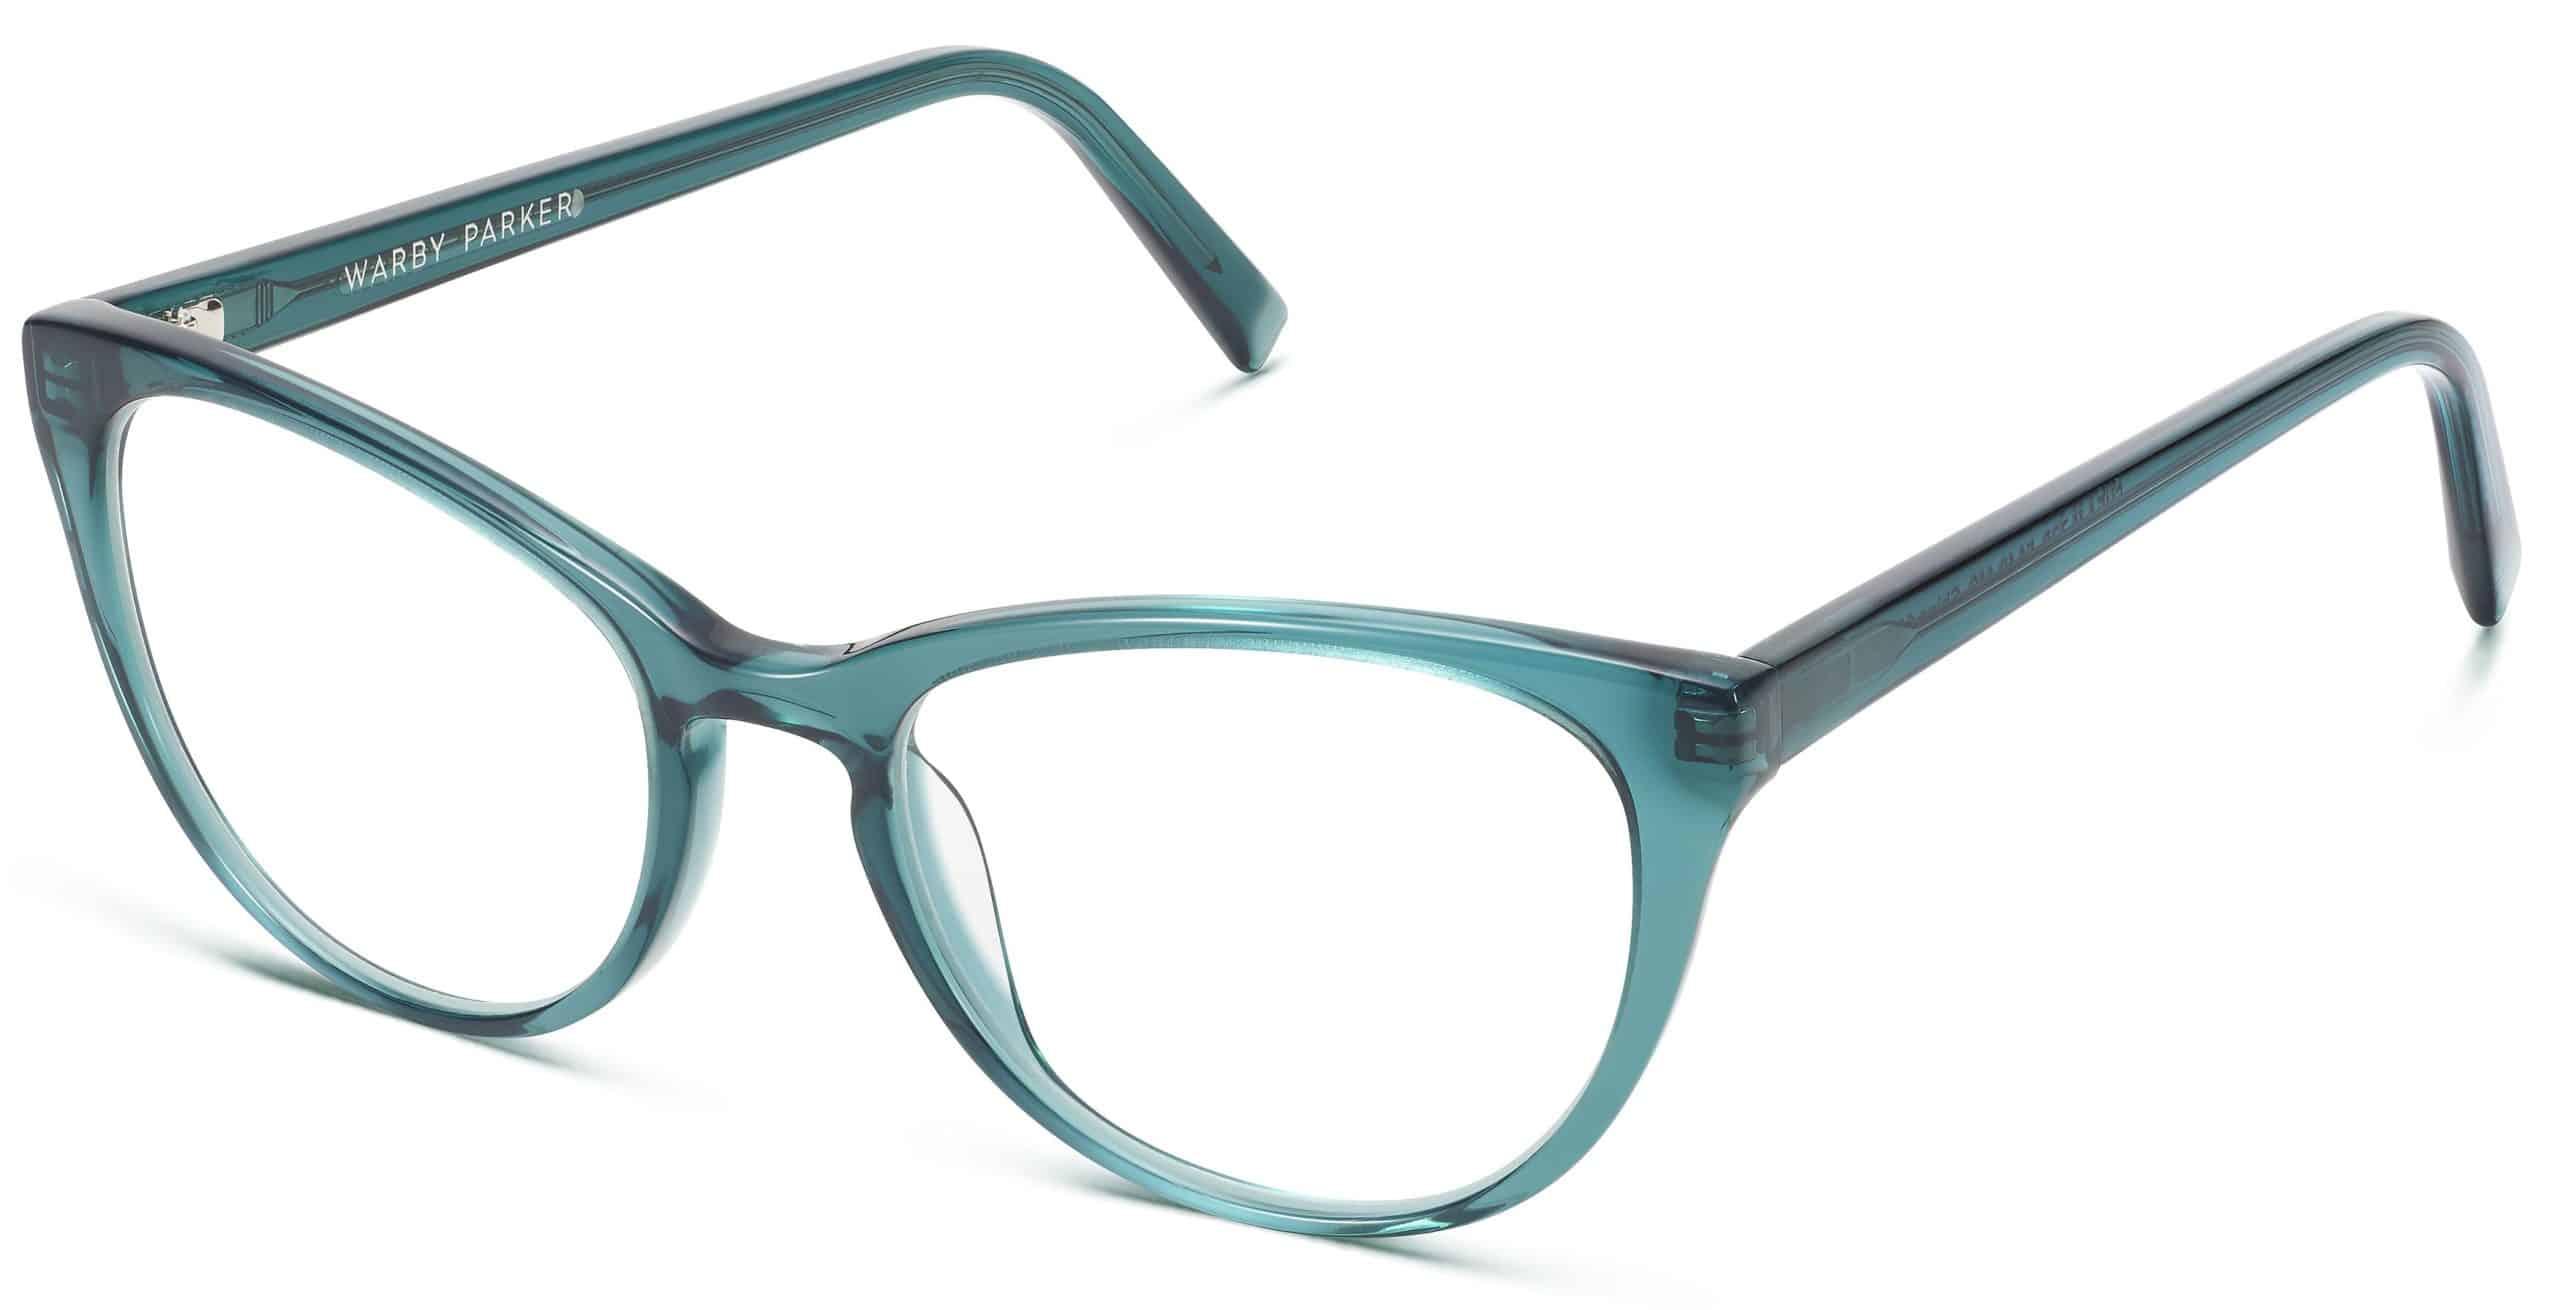 Shea Eyeglasses Review - Warby Parker - Peacock Green - 51-18-140 - Women